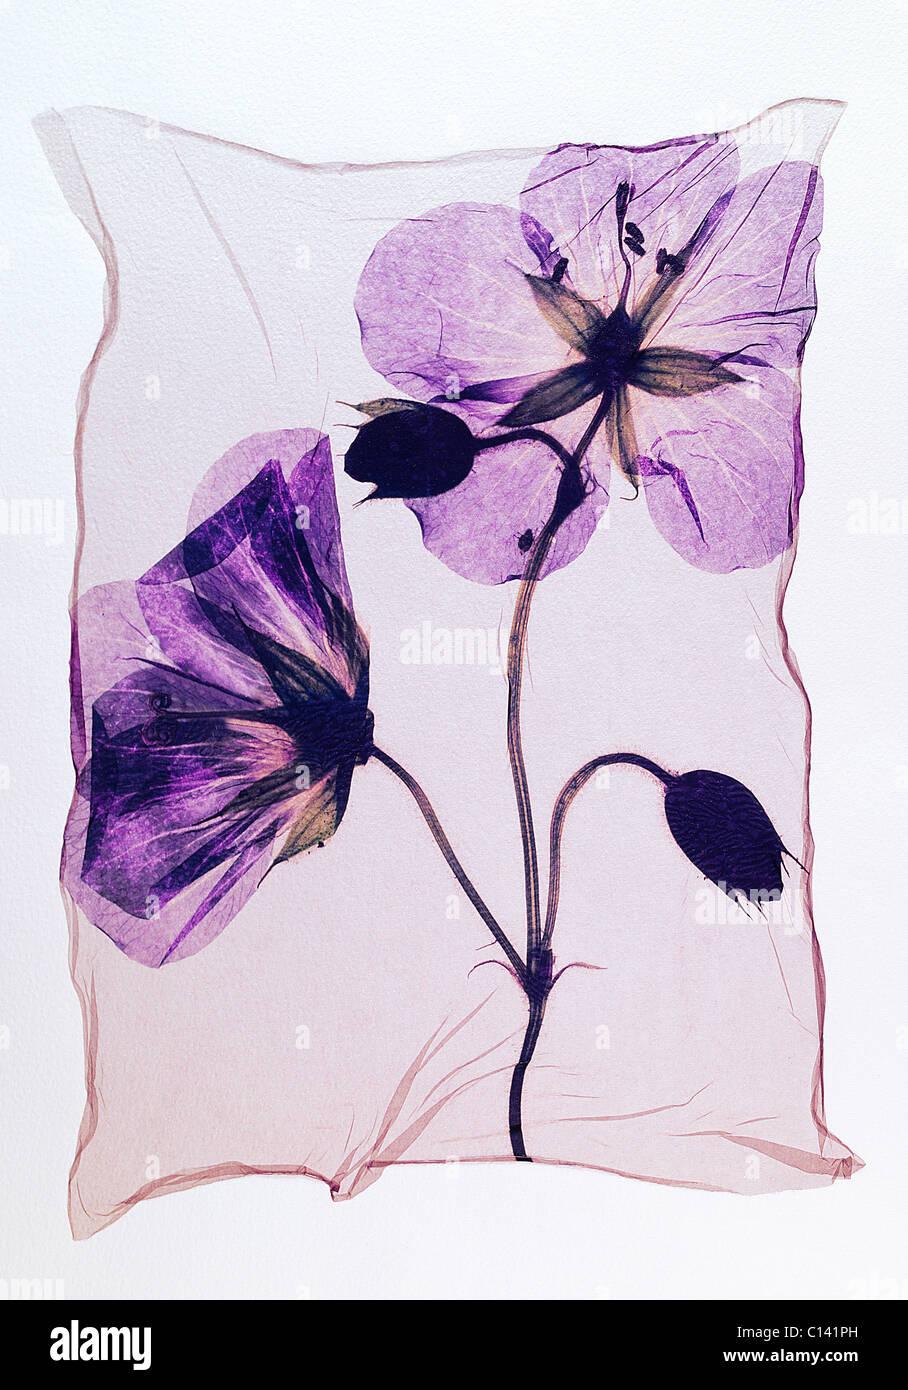 Pressed geranium ( Meadow Cranesbill ) - Wild flowers - Polaroid lift. - Stock Image